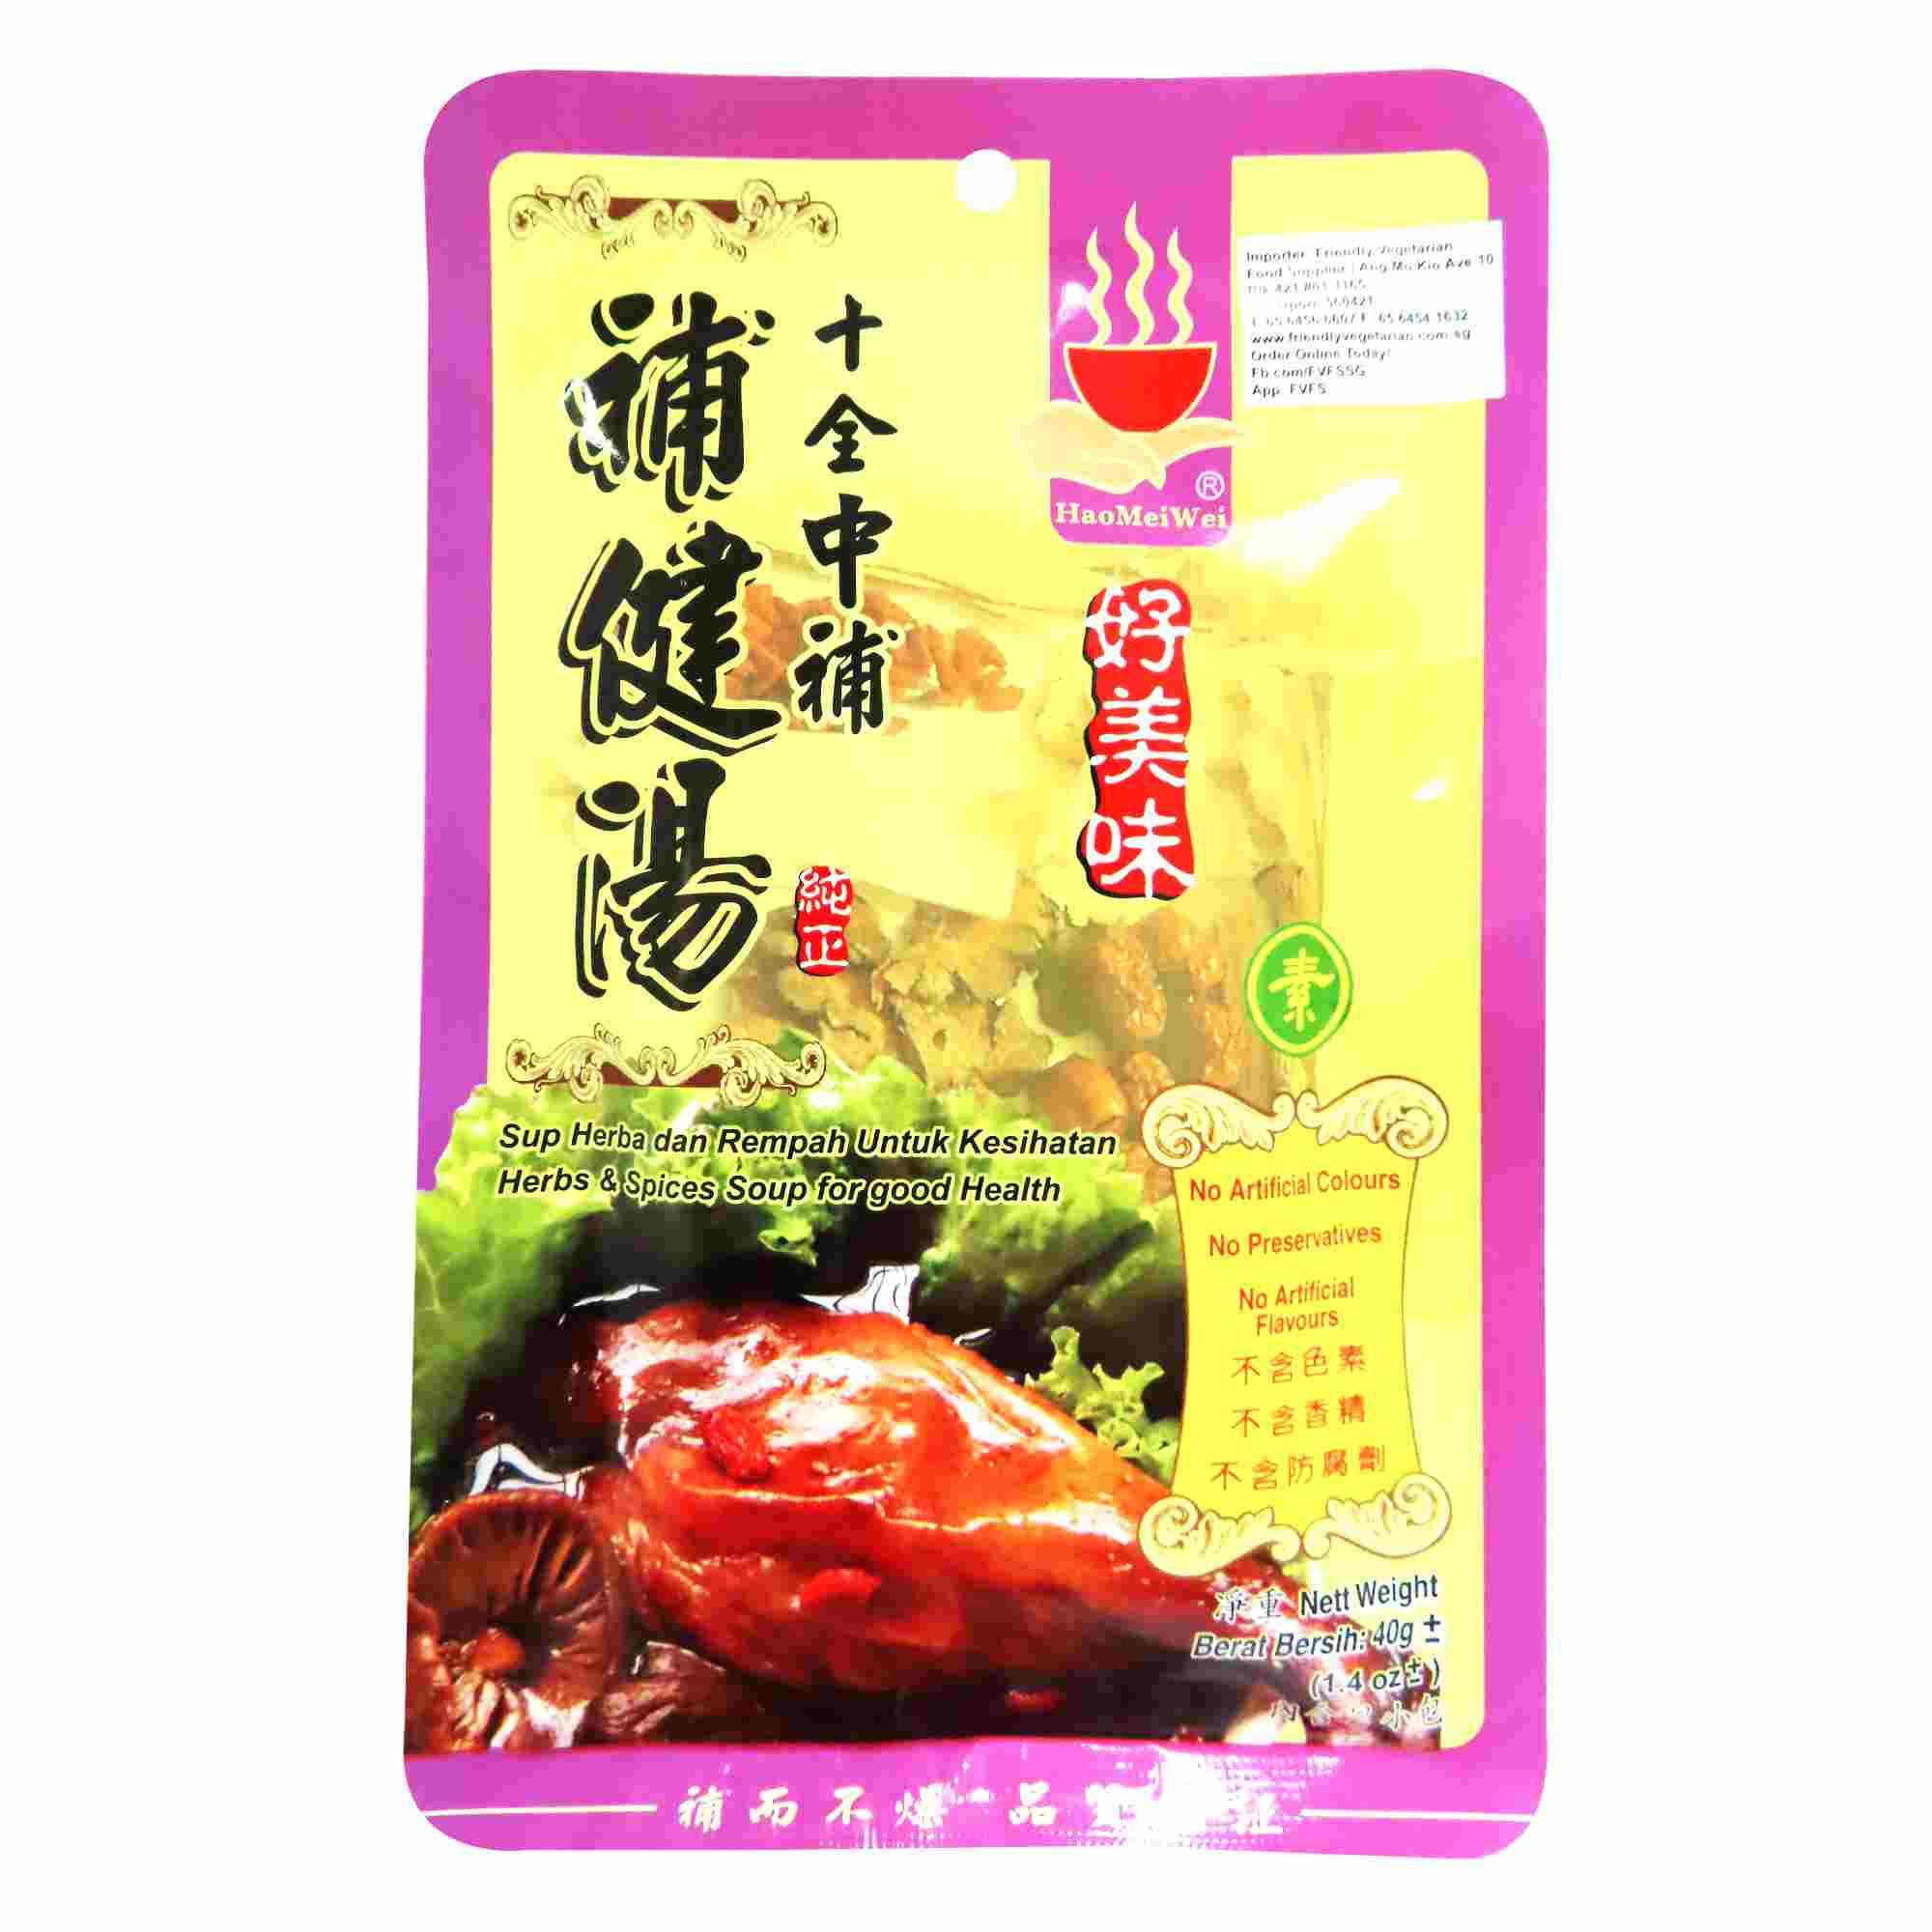 Image Herbs Soup 好美味 - 补健汤包 40grams